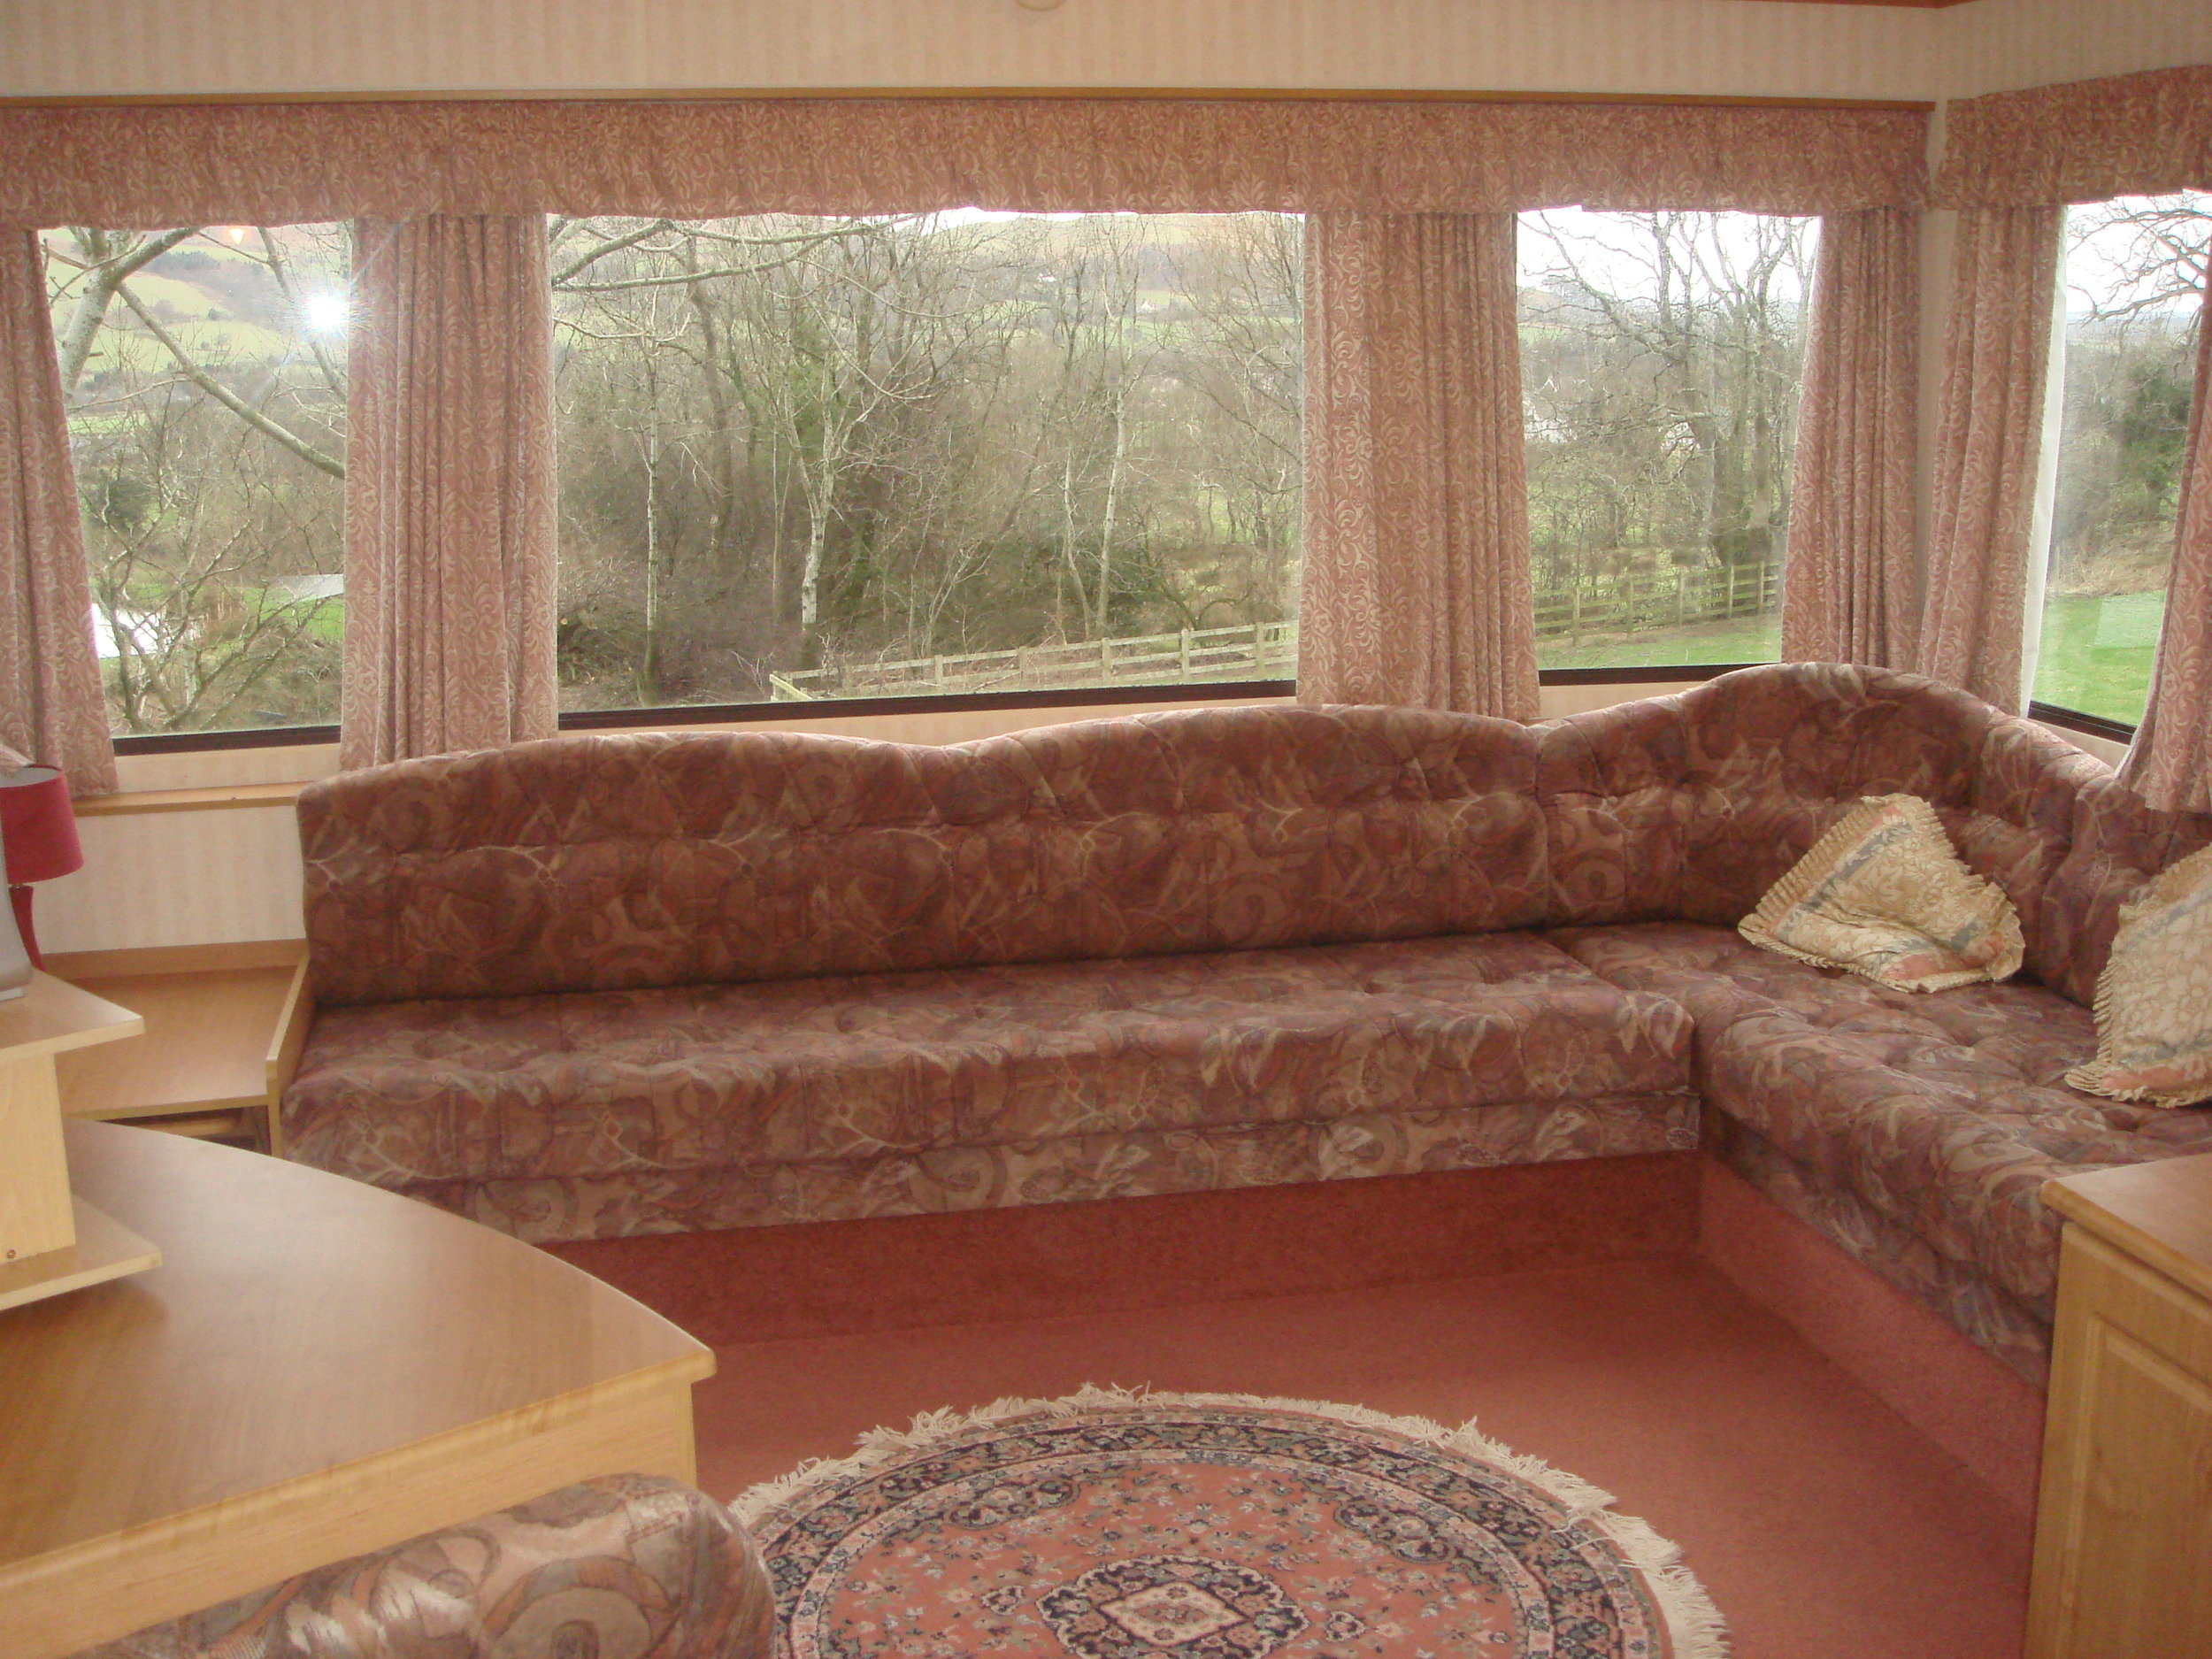 Living Room - Caravan 2 Lorton Vale Caravans lortonvalecaravans.co.uk